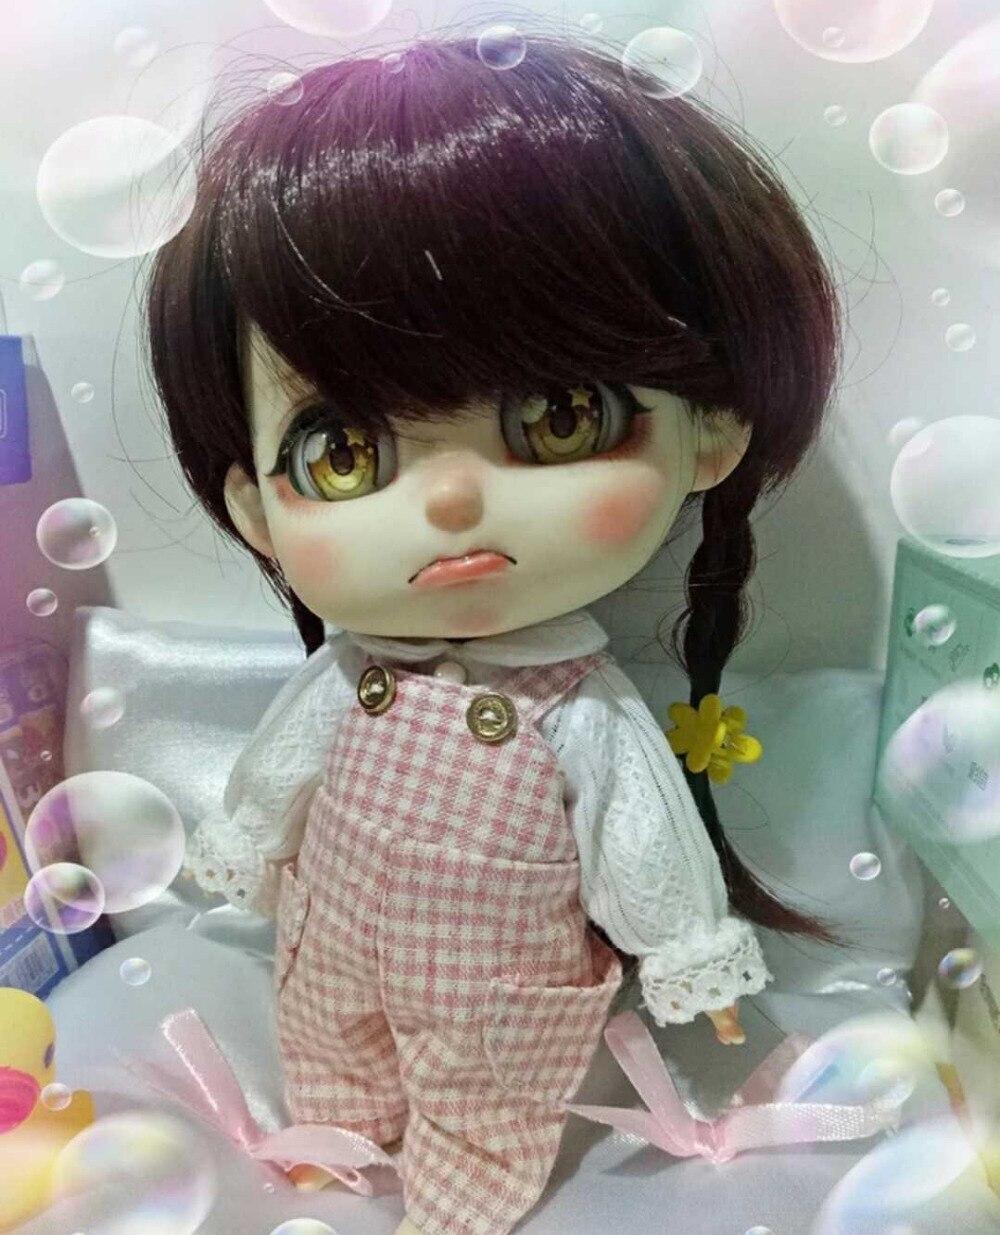 2019bjd doll Free Shipping 1 8 BJD Doll Bruce